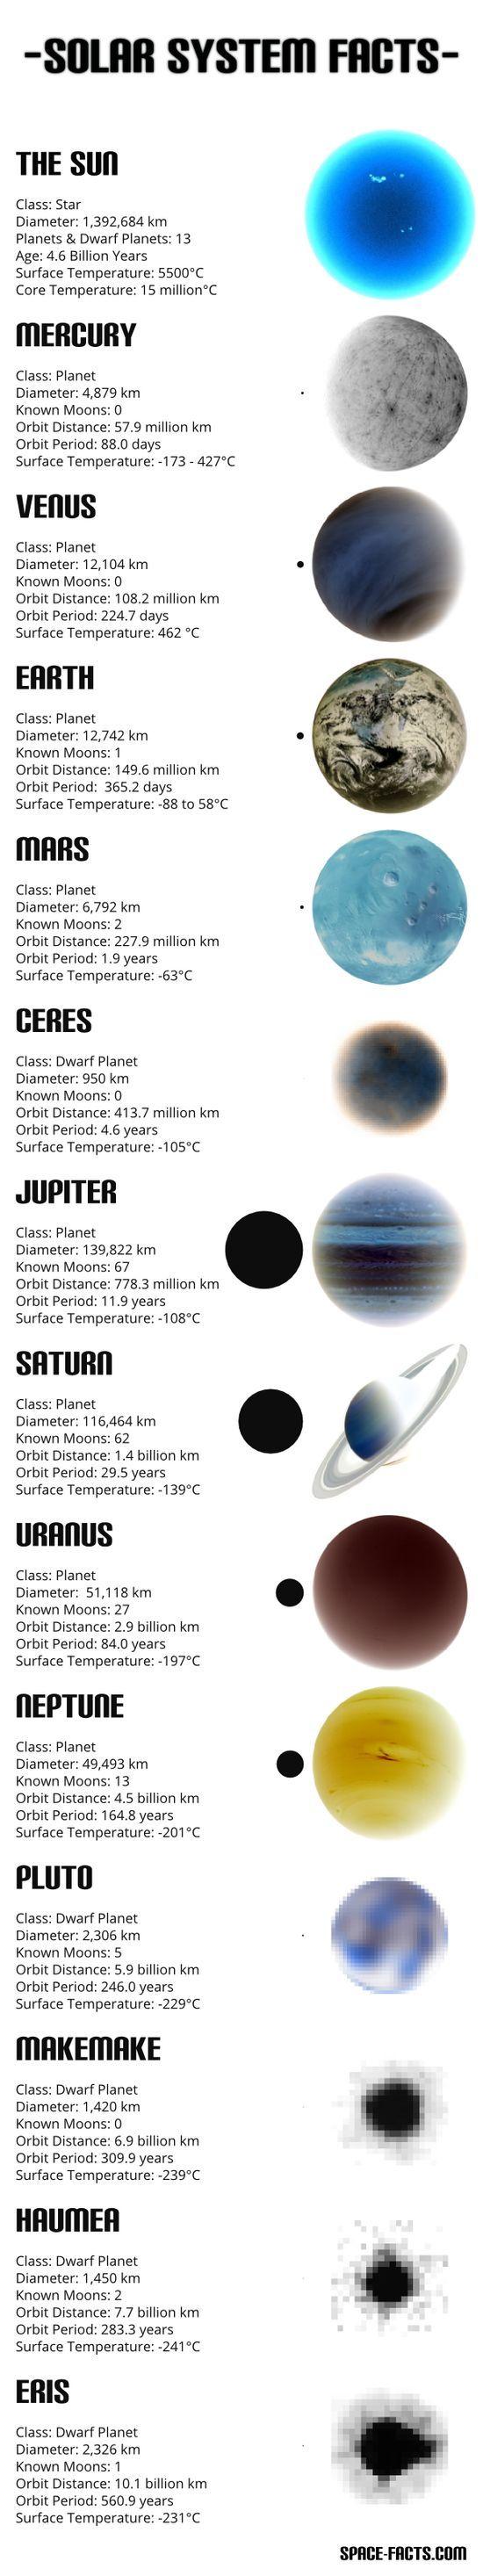 solar system details - photo #22